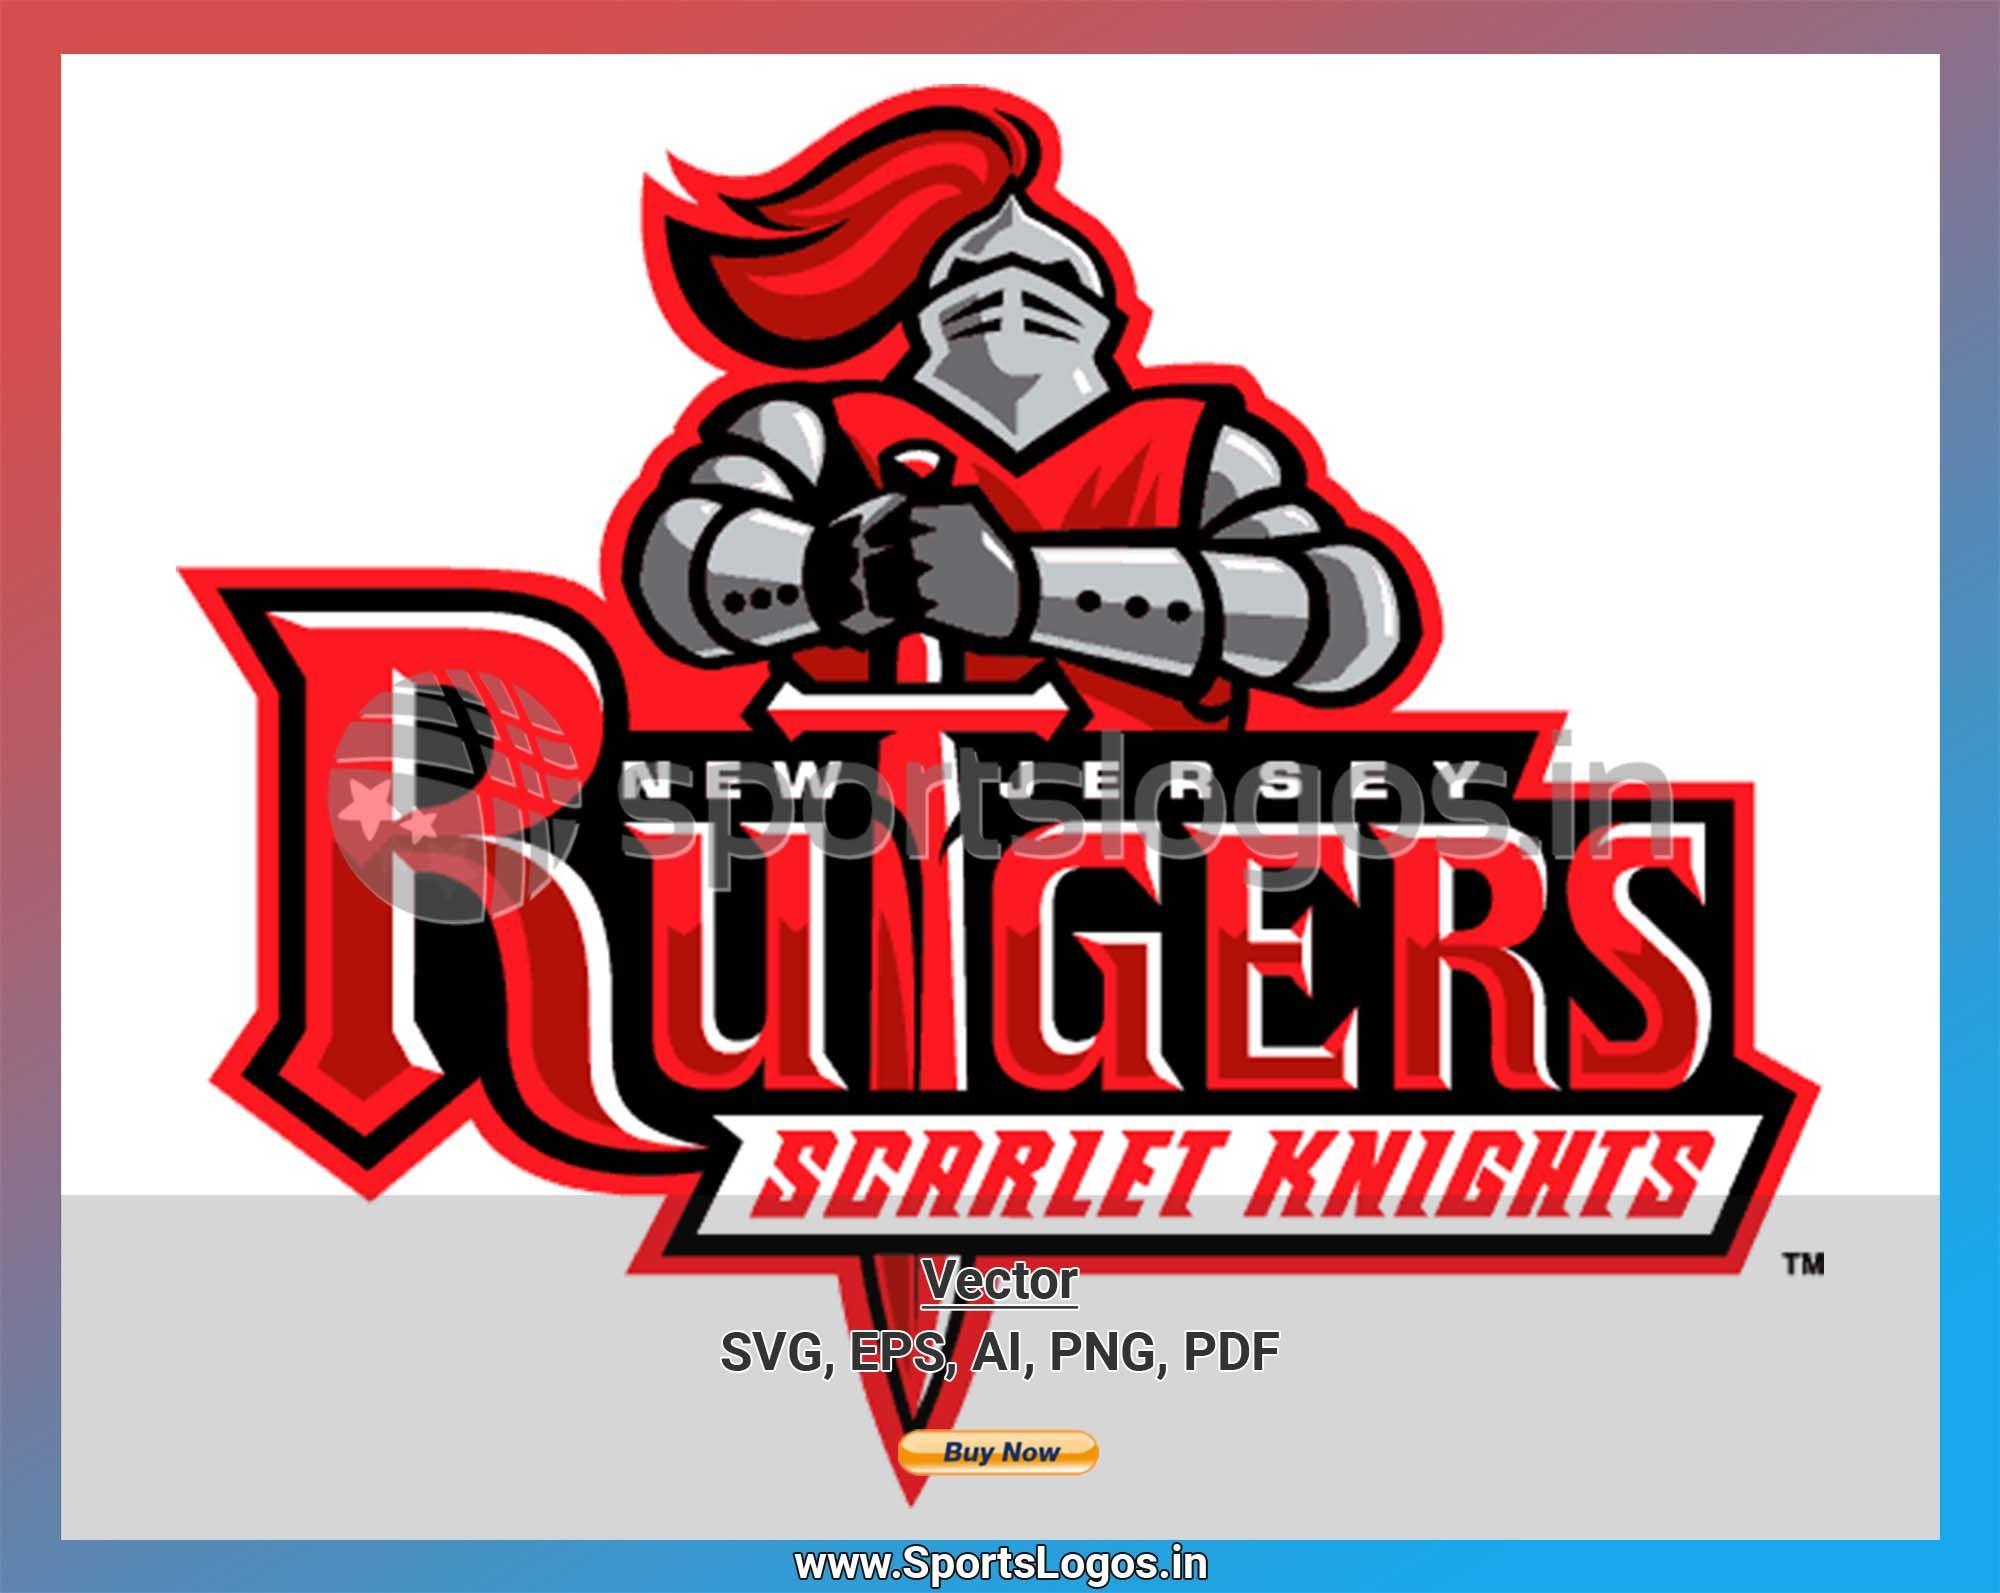 Rutgers Scarlet Knights 19952003, NCAA Division I (nr